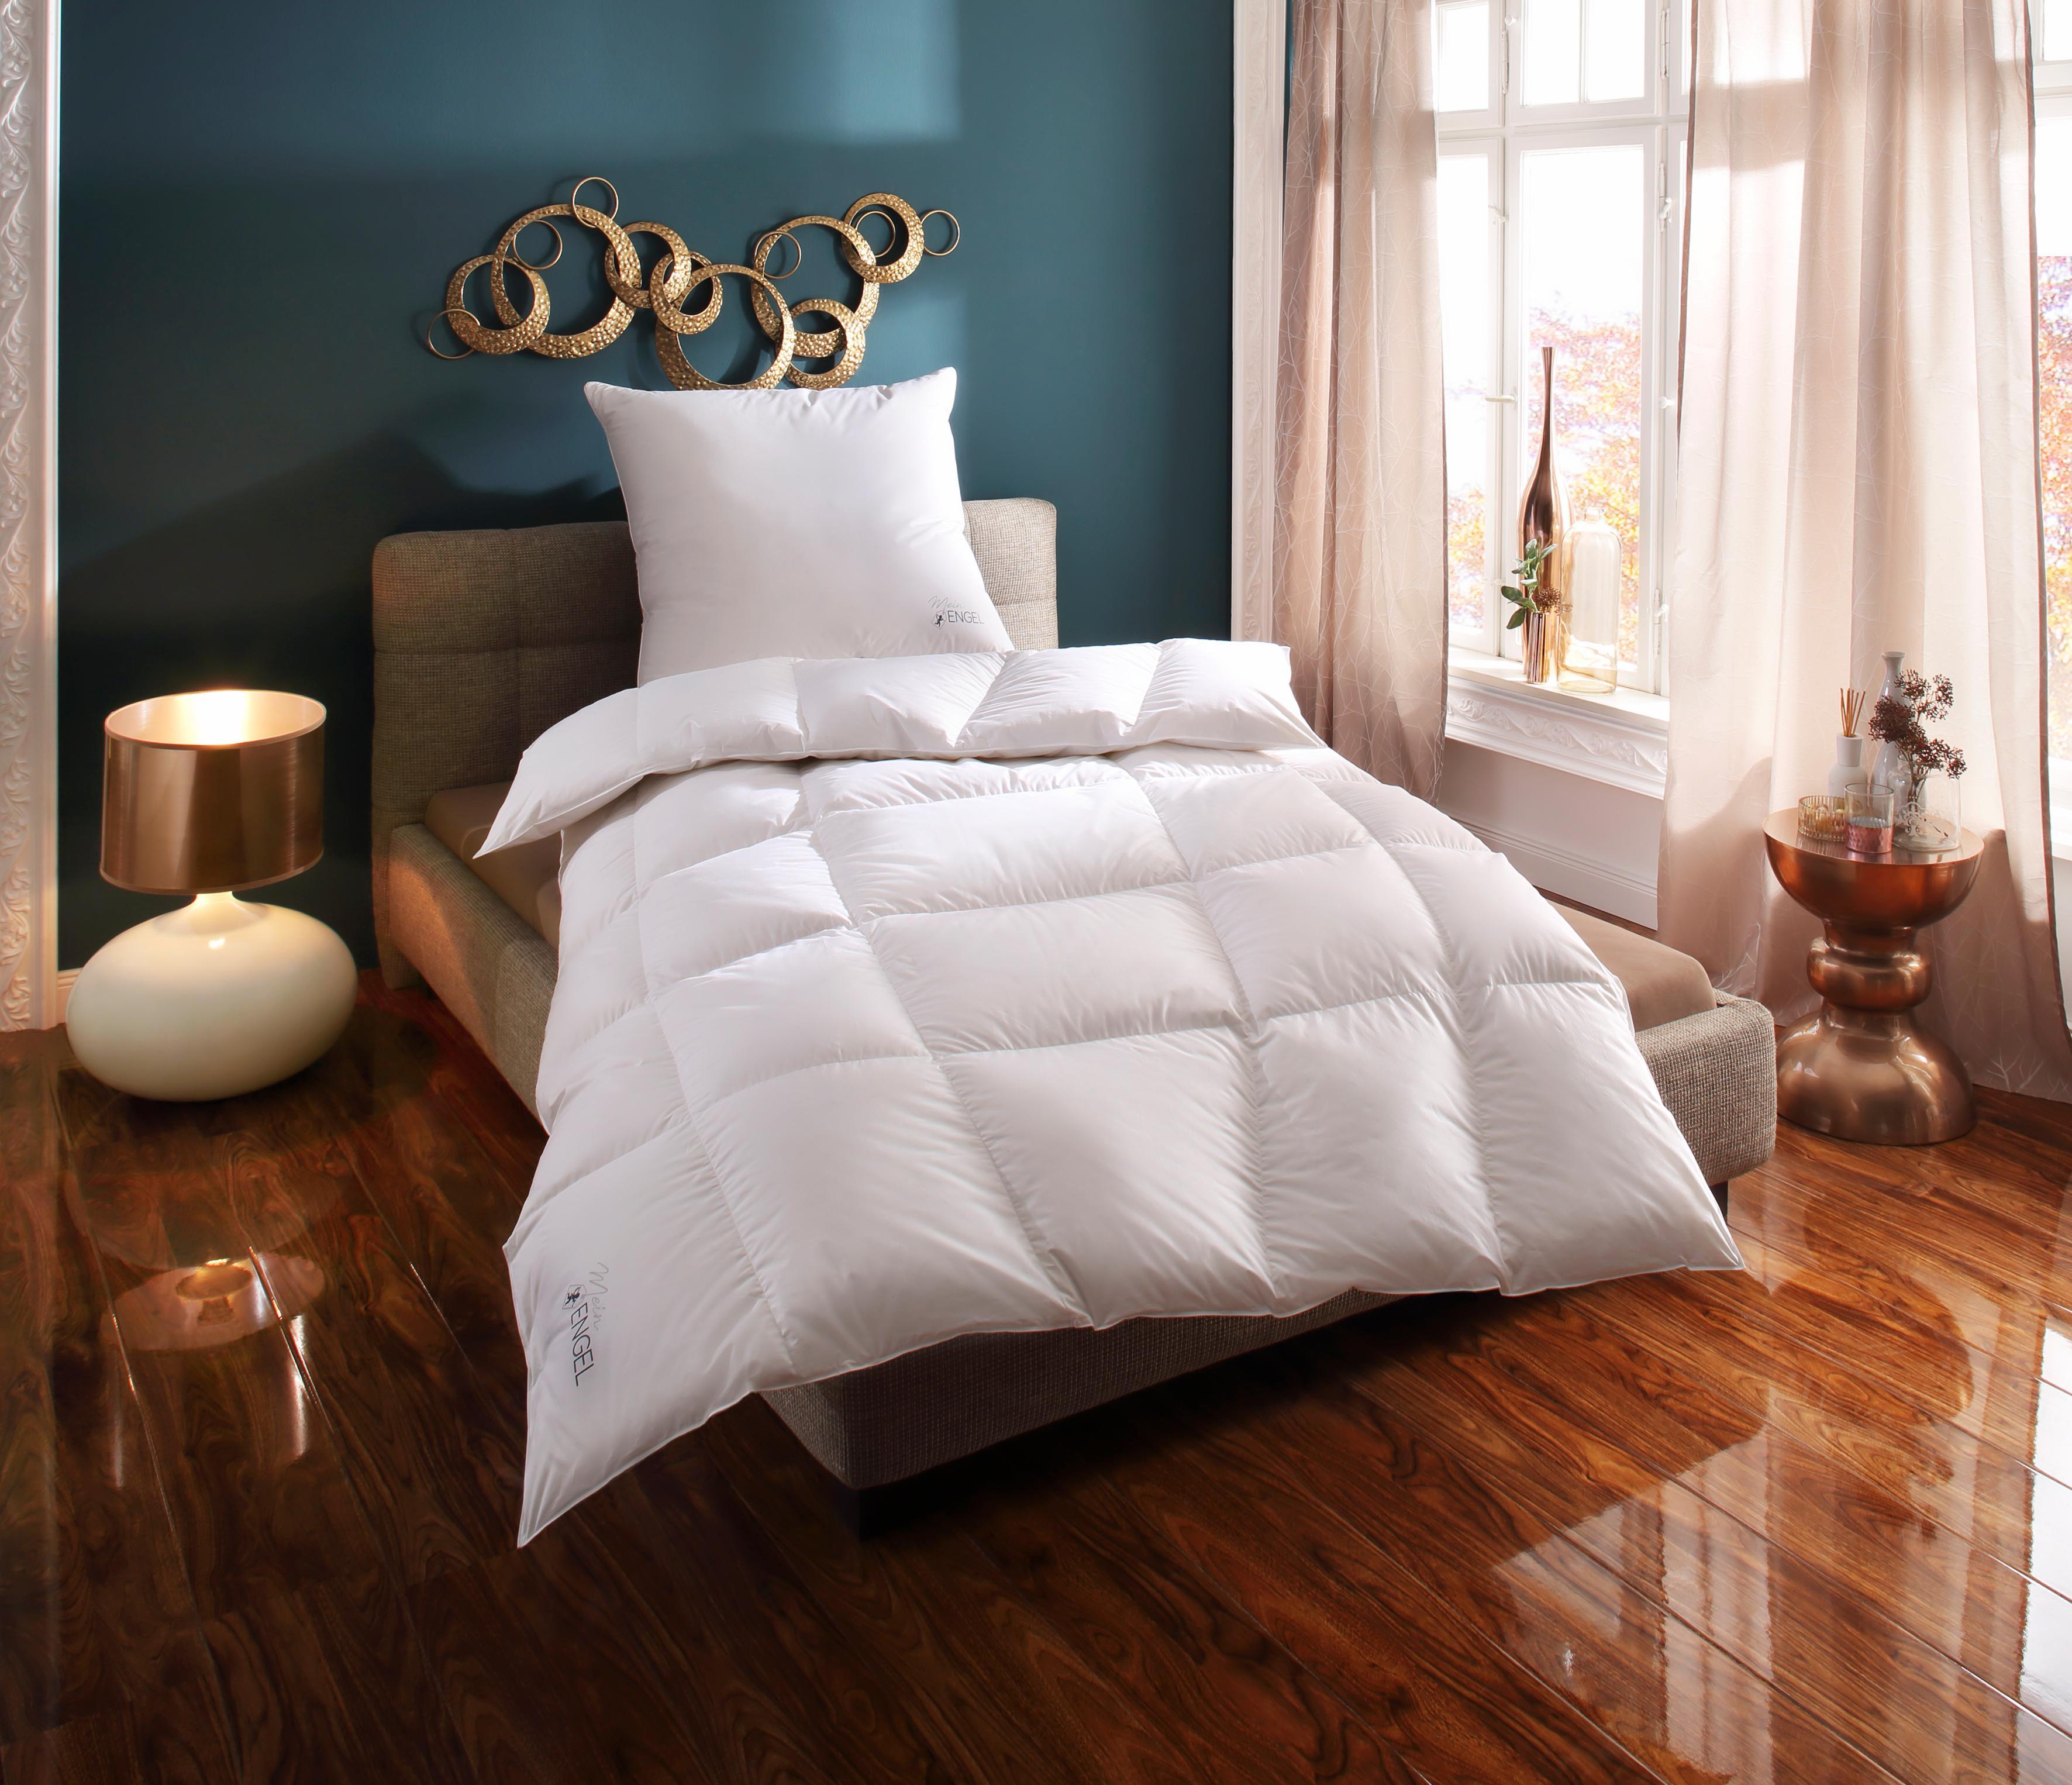 Daunenbettdecke Mein Engel Schlafstil warm Füllung: 100% Gänsedaunen Bezug: 100% Baumwolle